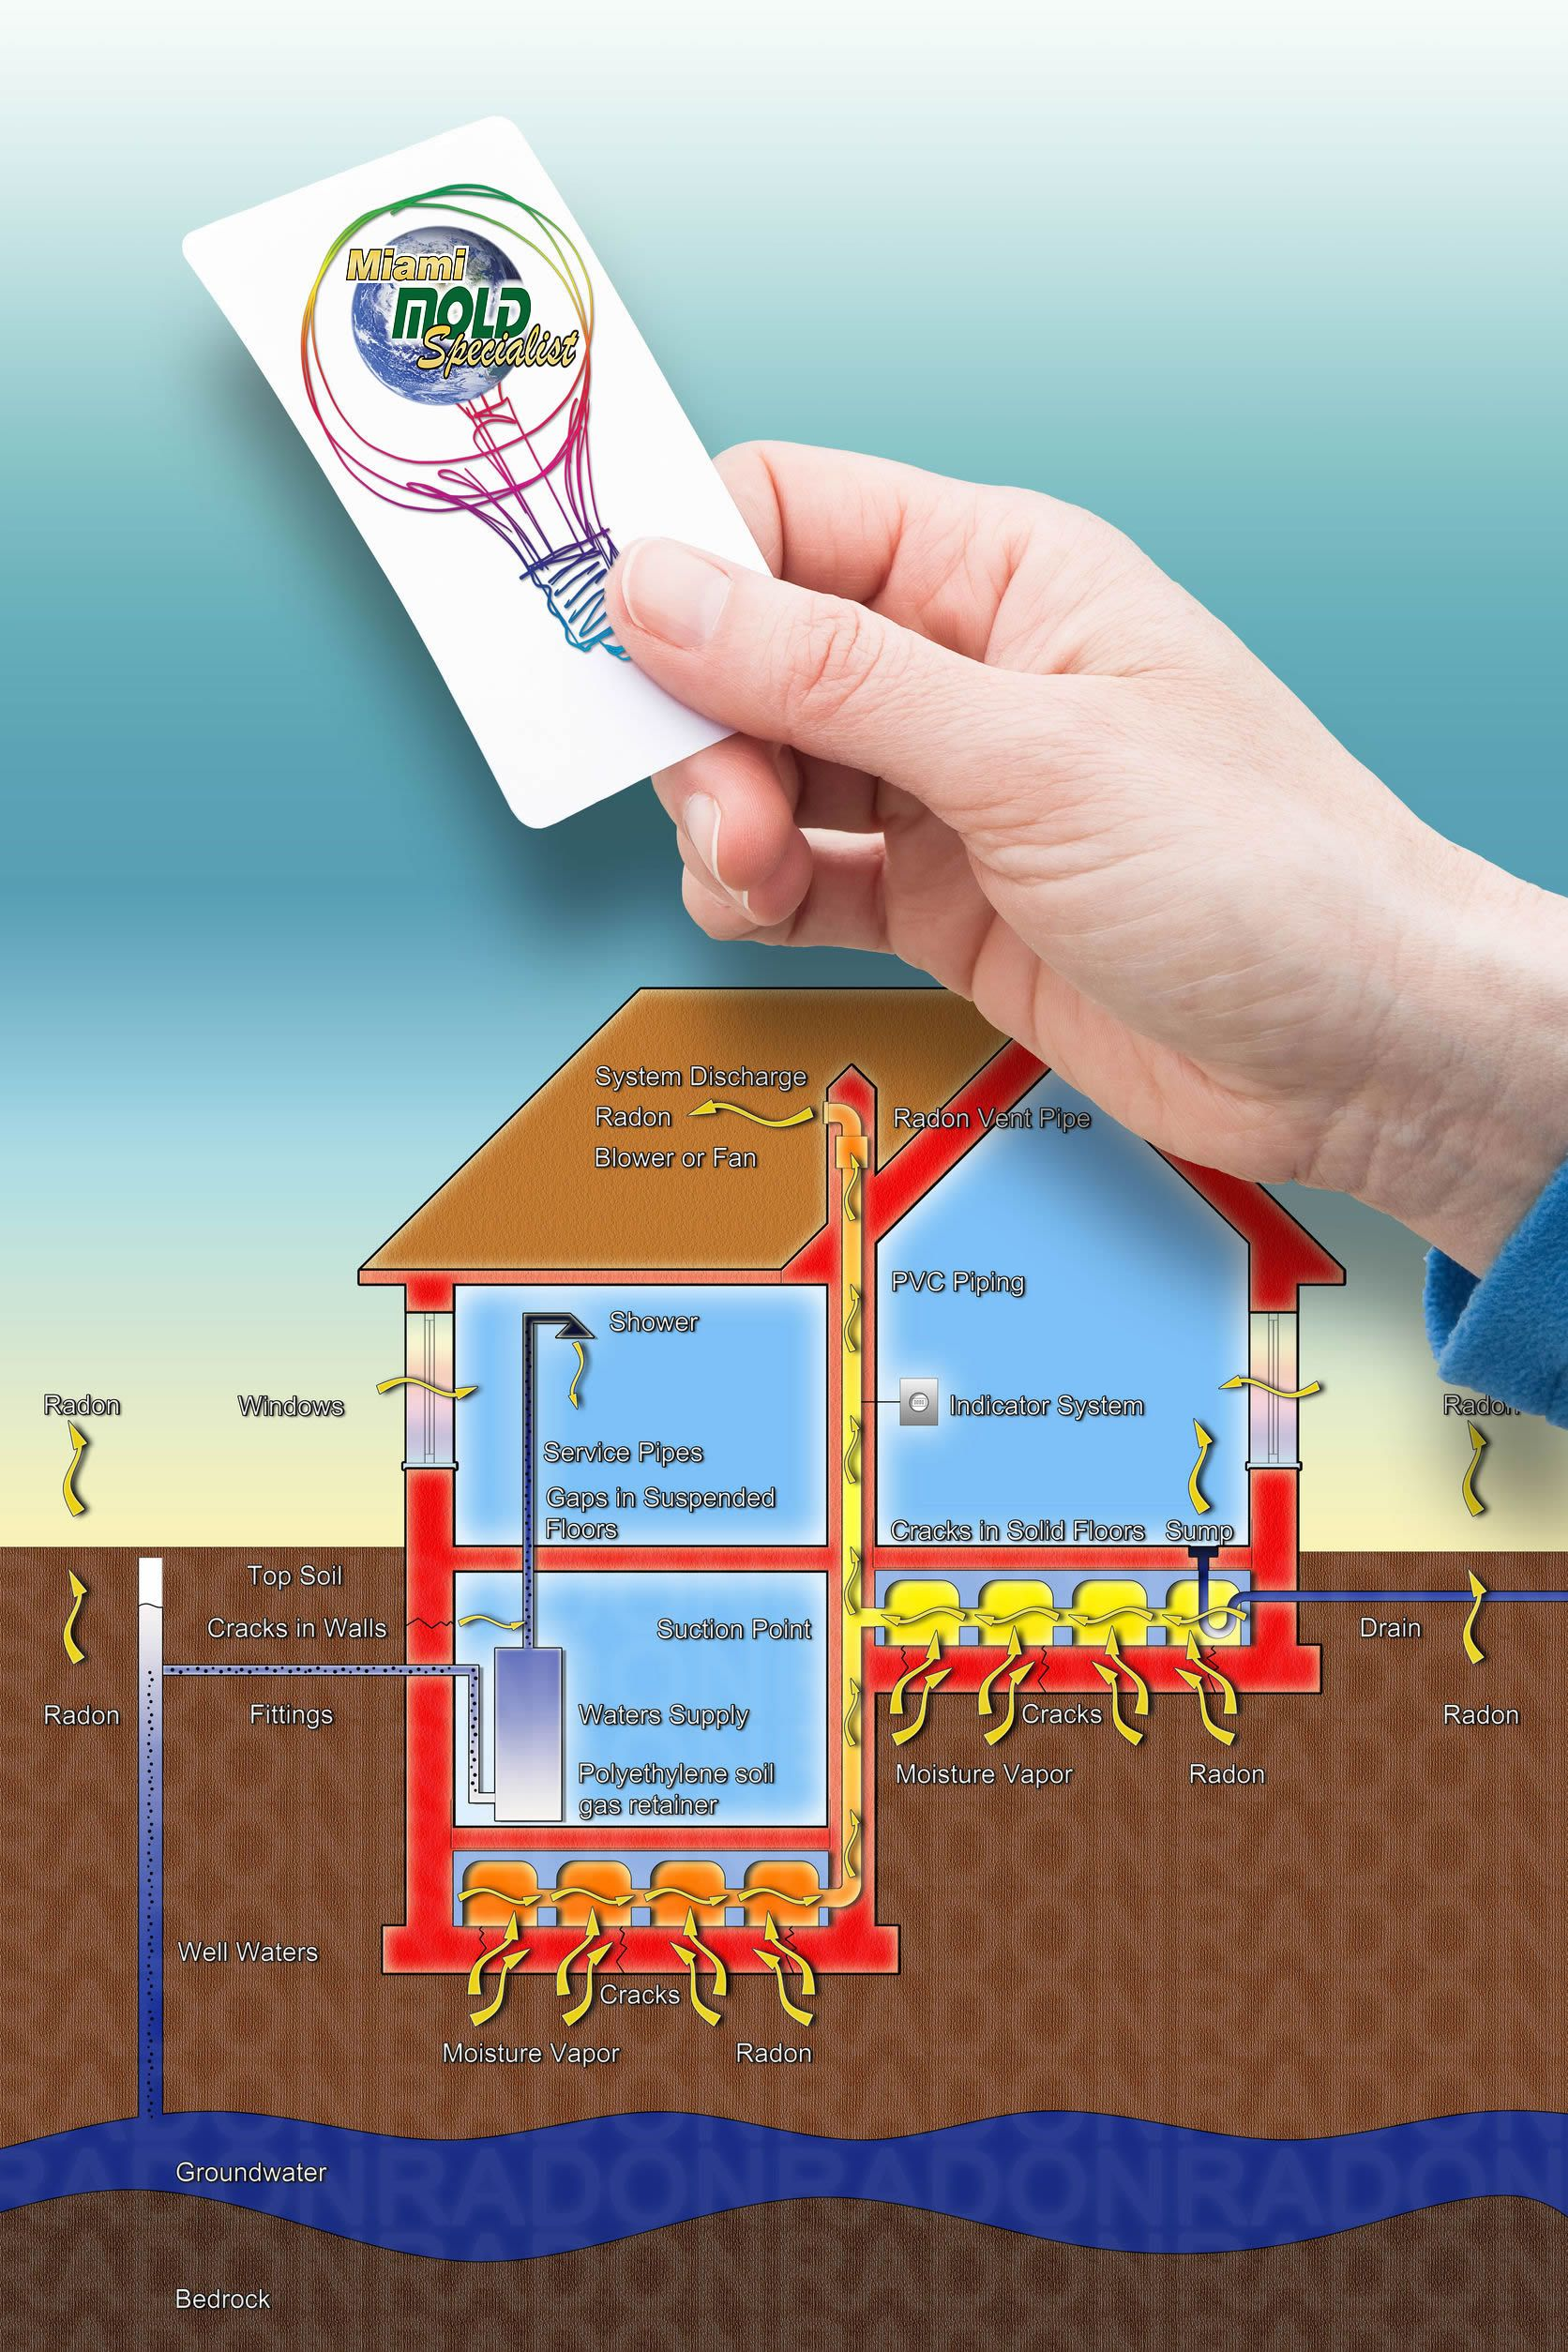 South FL Radon Inspection and Radon Testing Services Now